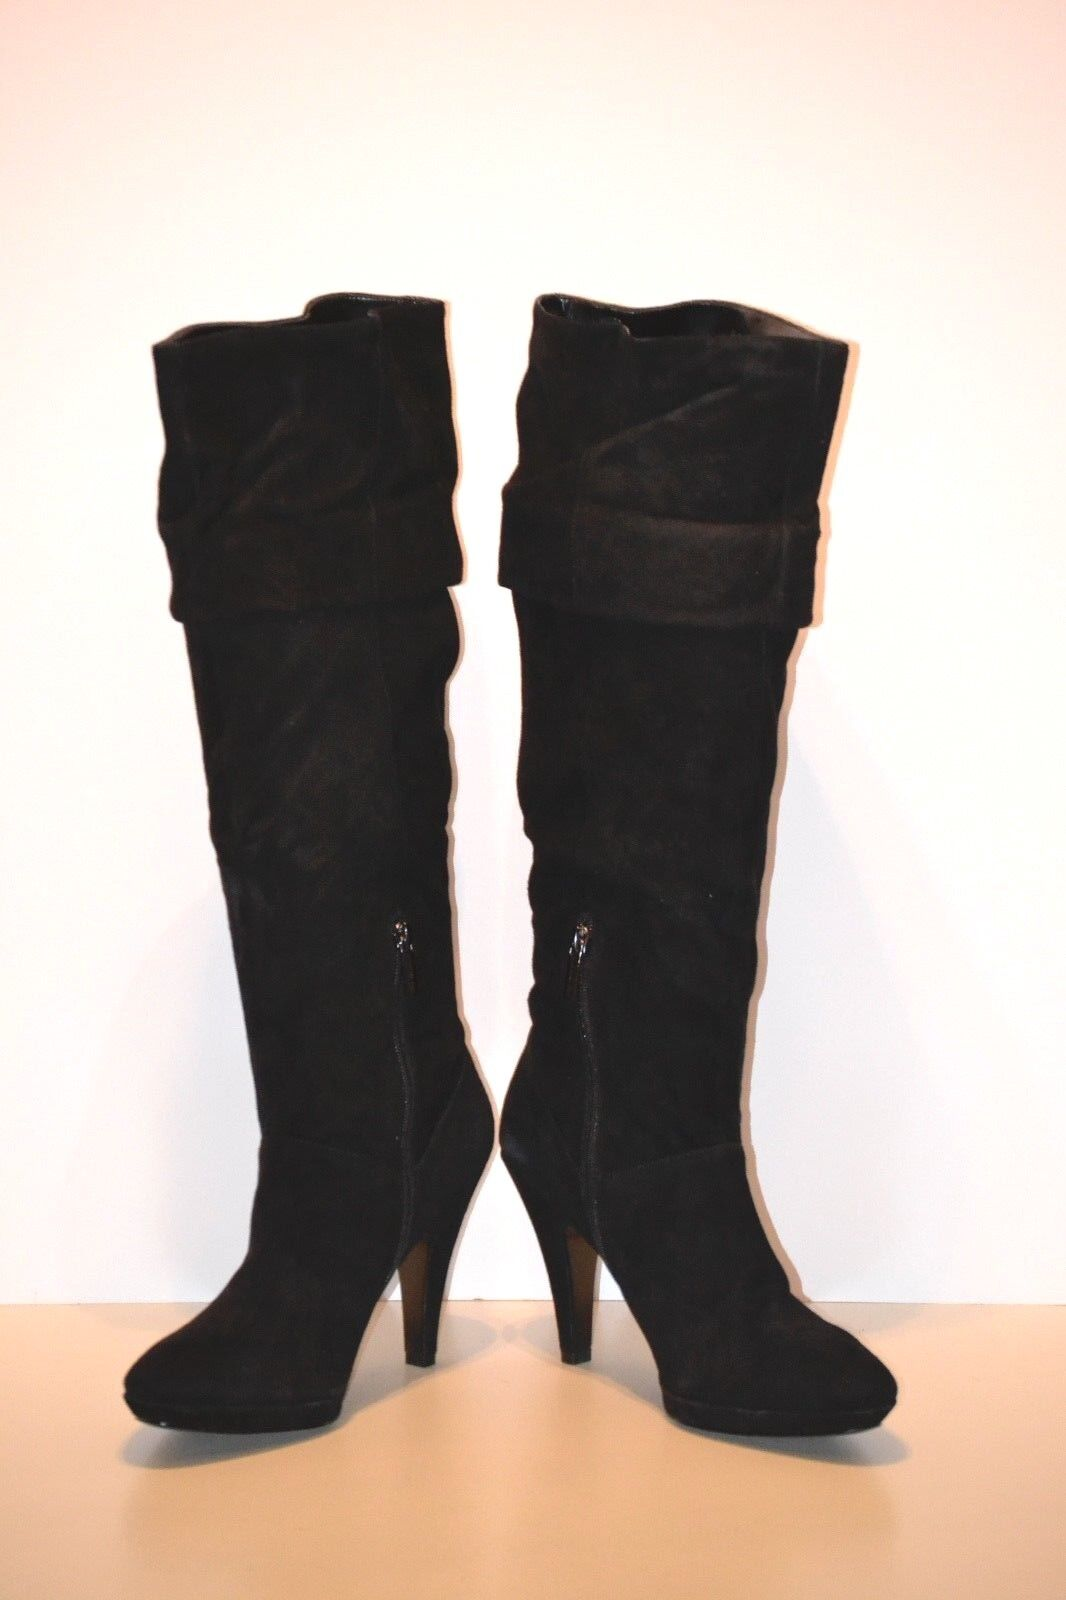 BANDOLINO BANDOLINO BANDOLINO Jess Women's Black Suede knee high Boots Size 9.5M a3b52c